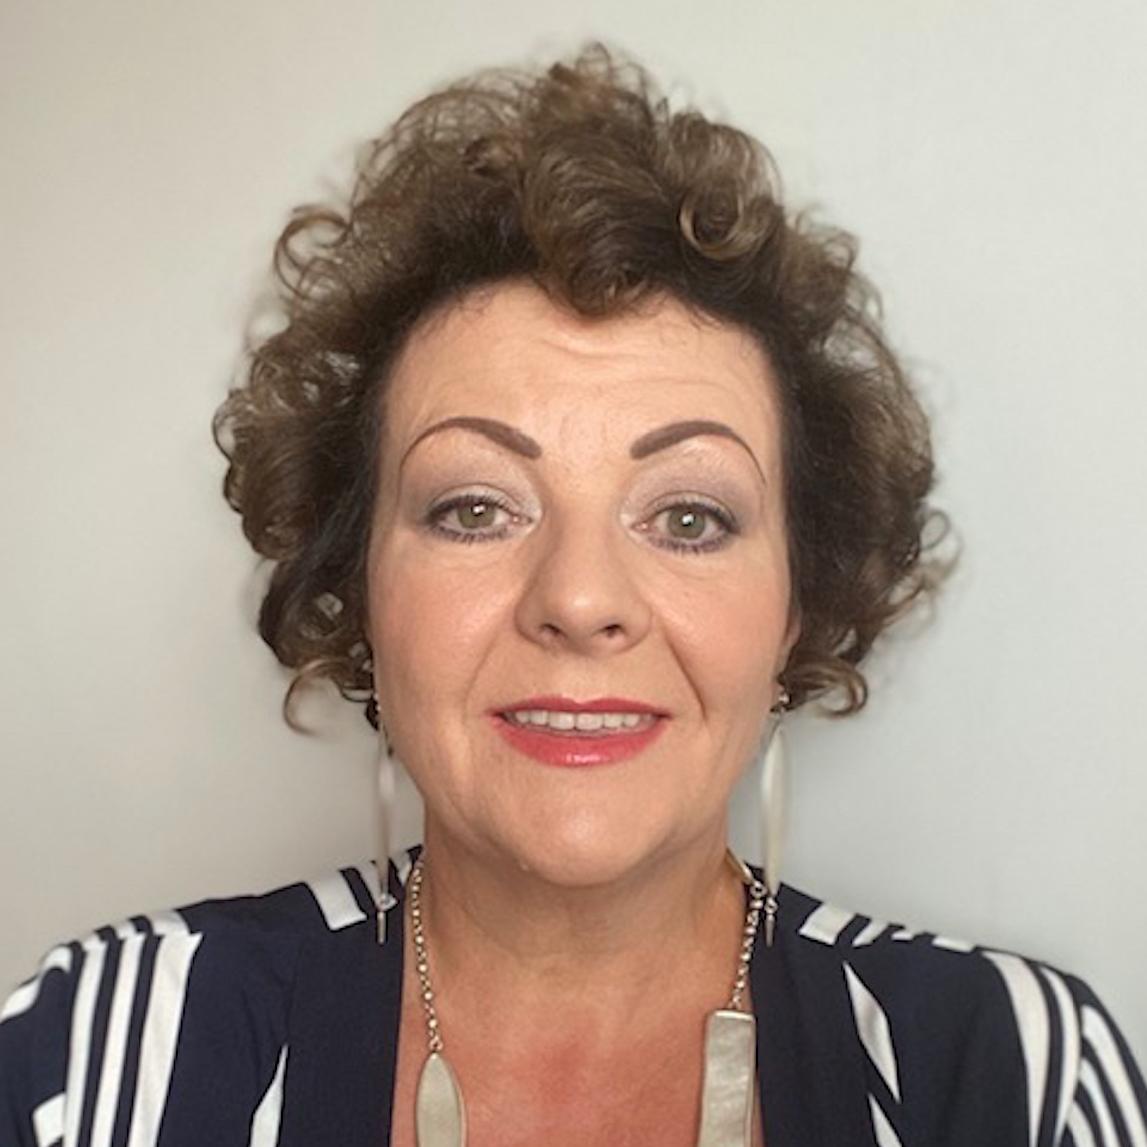 Nicola Tunbridge